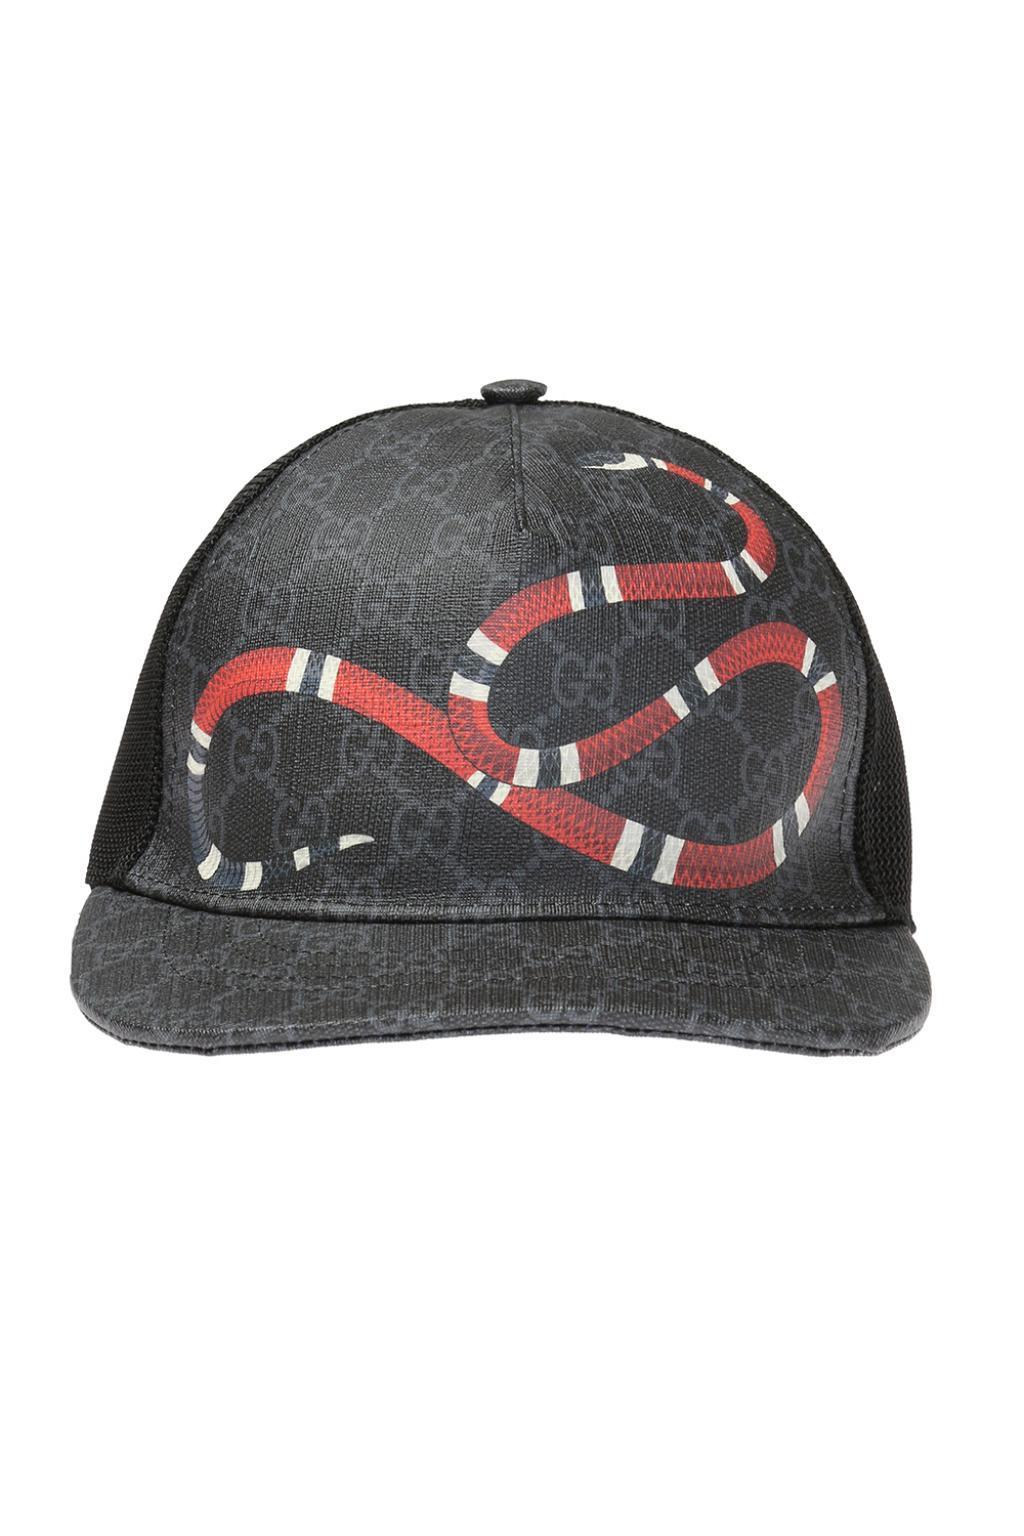 78ac583401e Lyst - Gucci Baseball Cap Made Of  GG Supreme  Canvas for Men